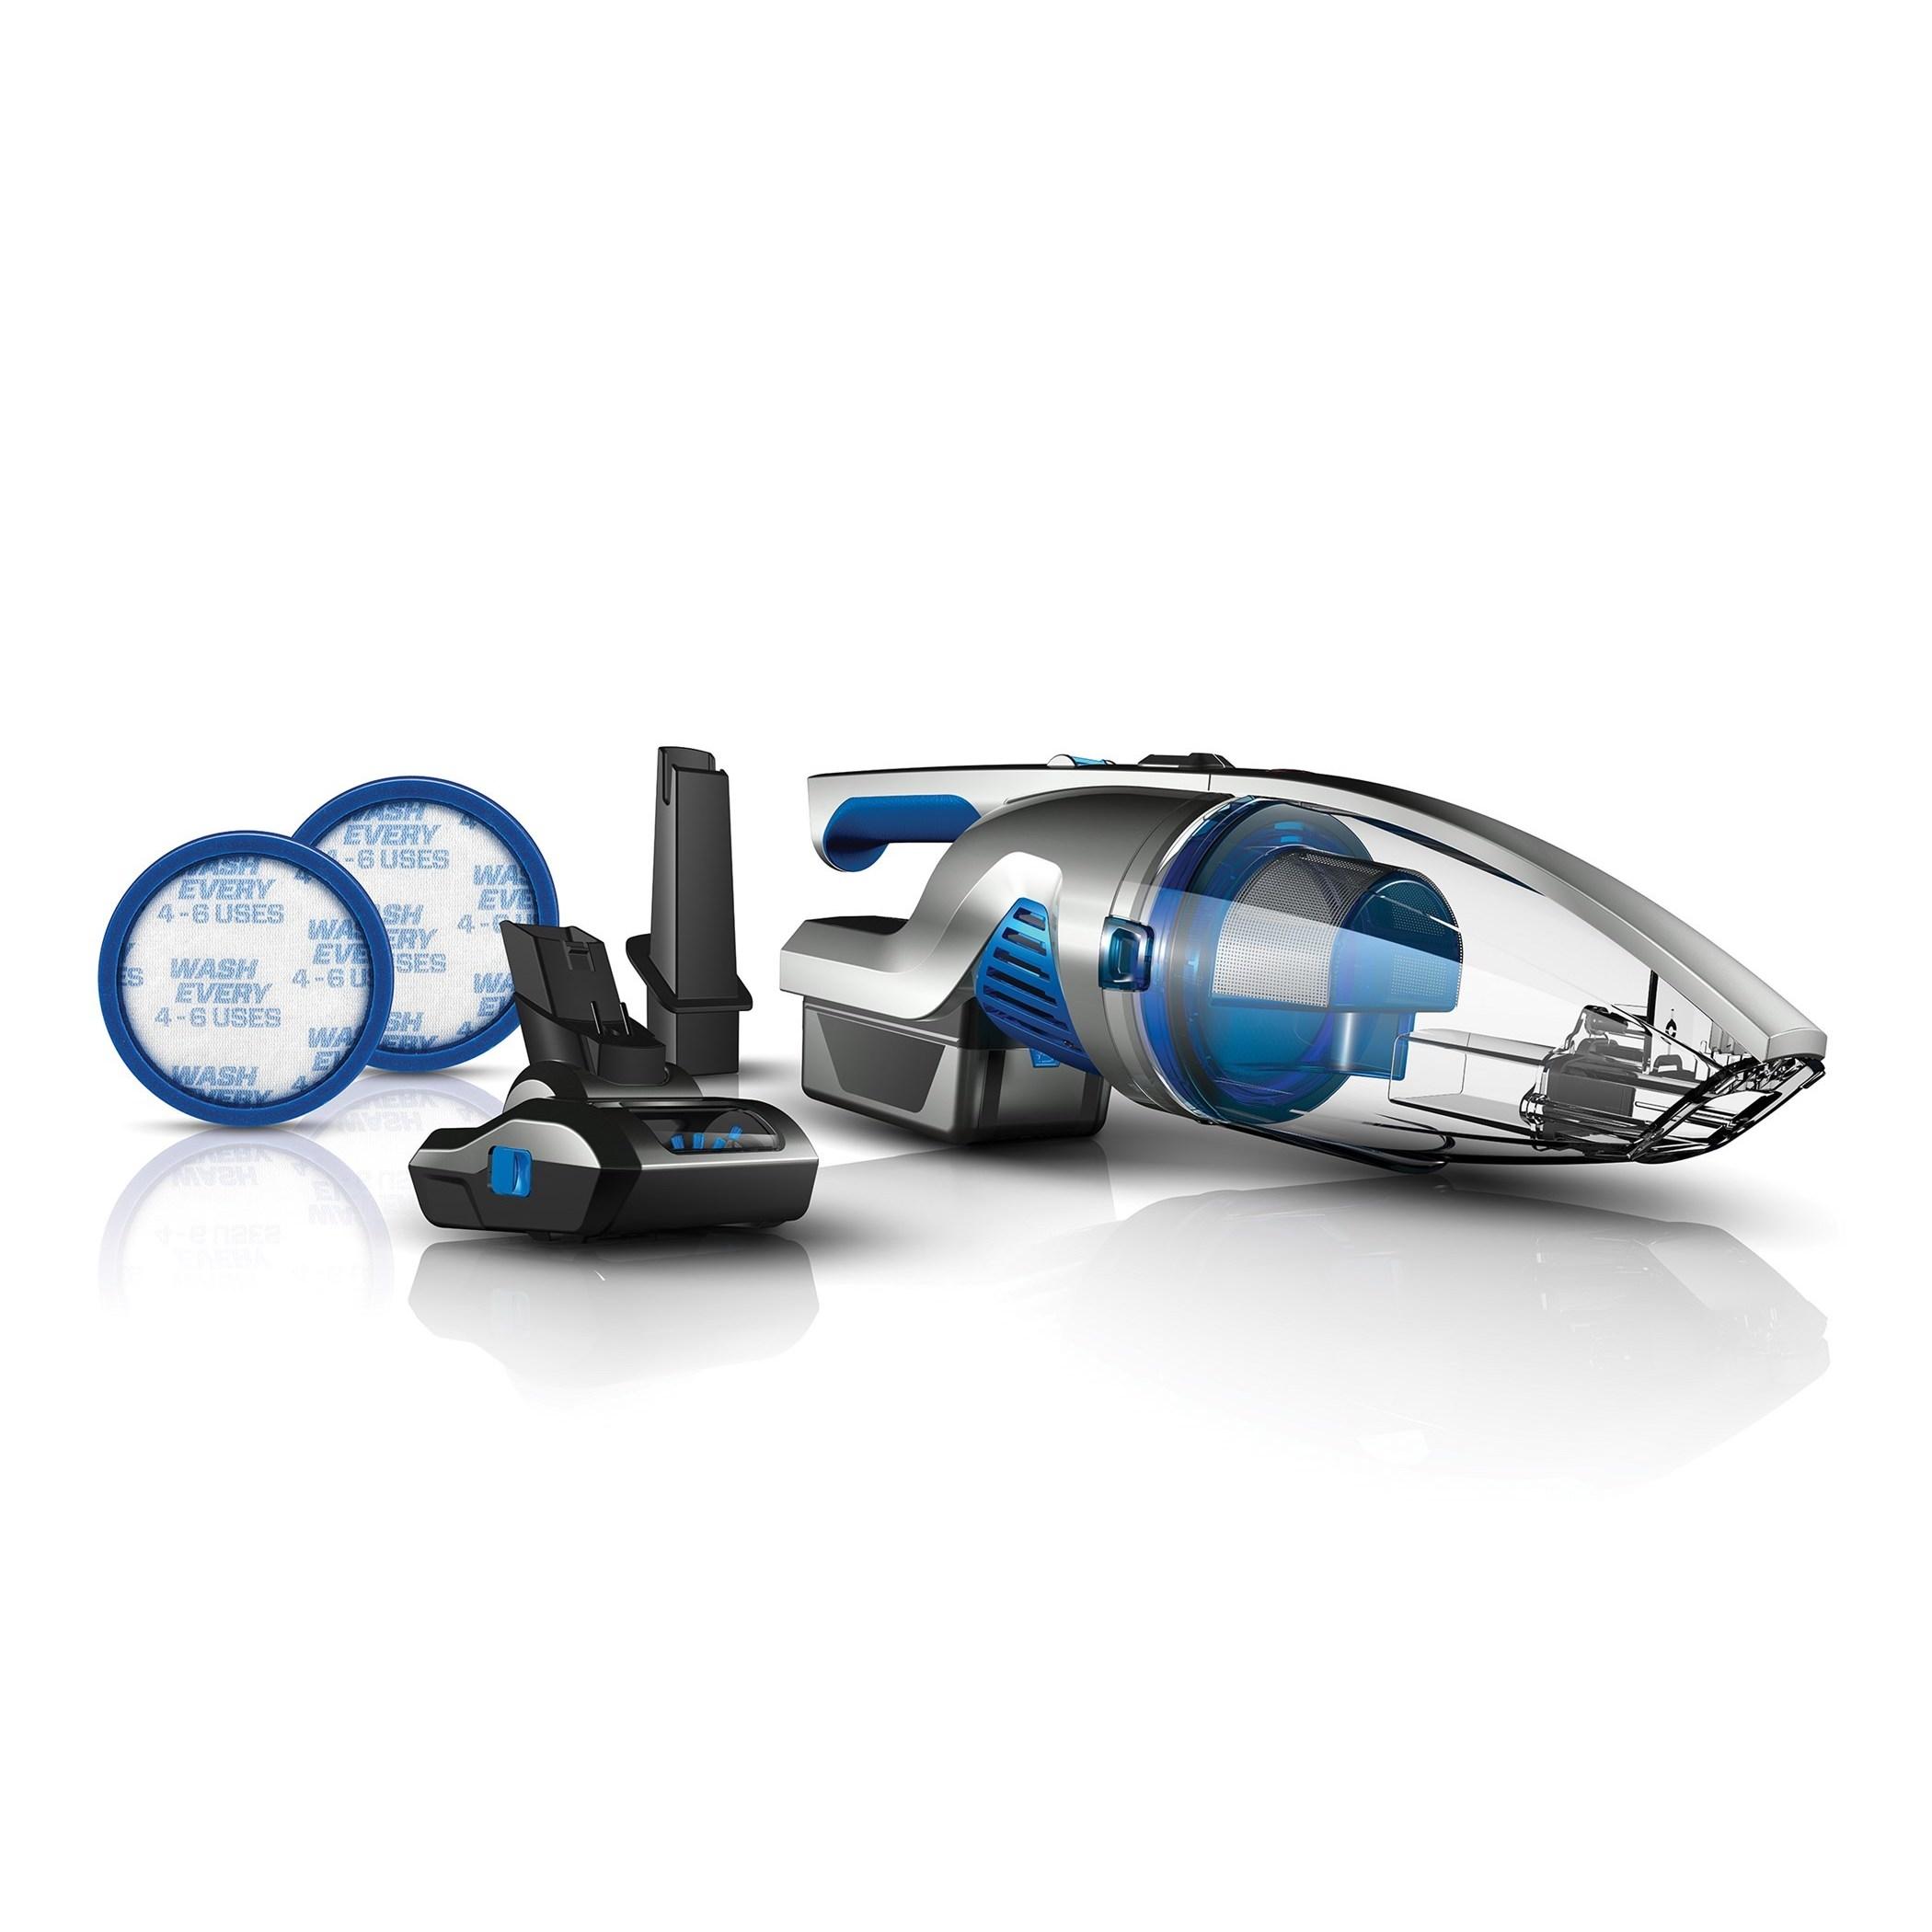 Hoover BH52160PC Air Cordless Handheld Vacuum, Blue